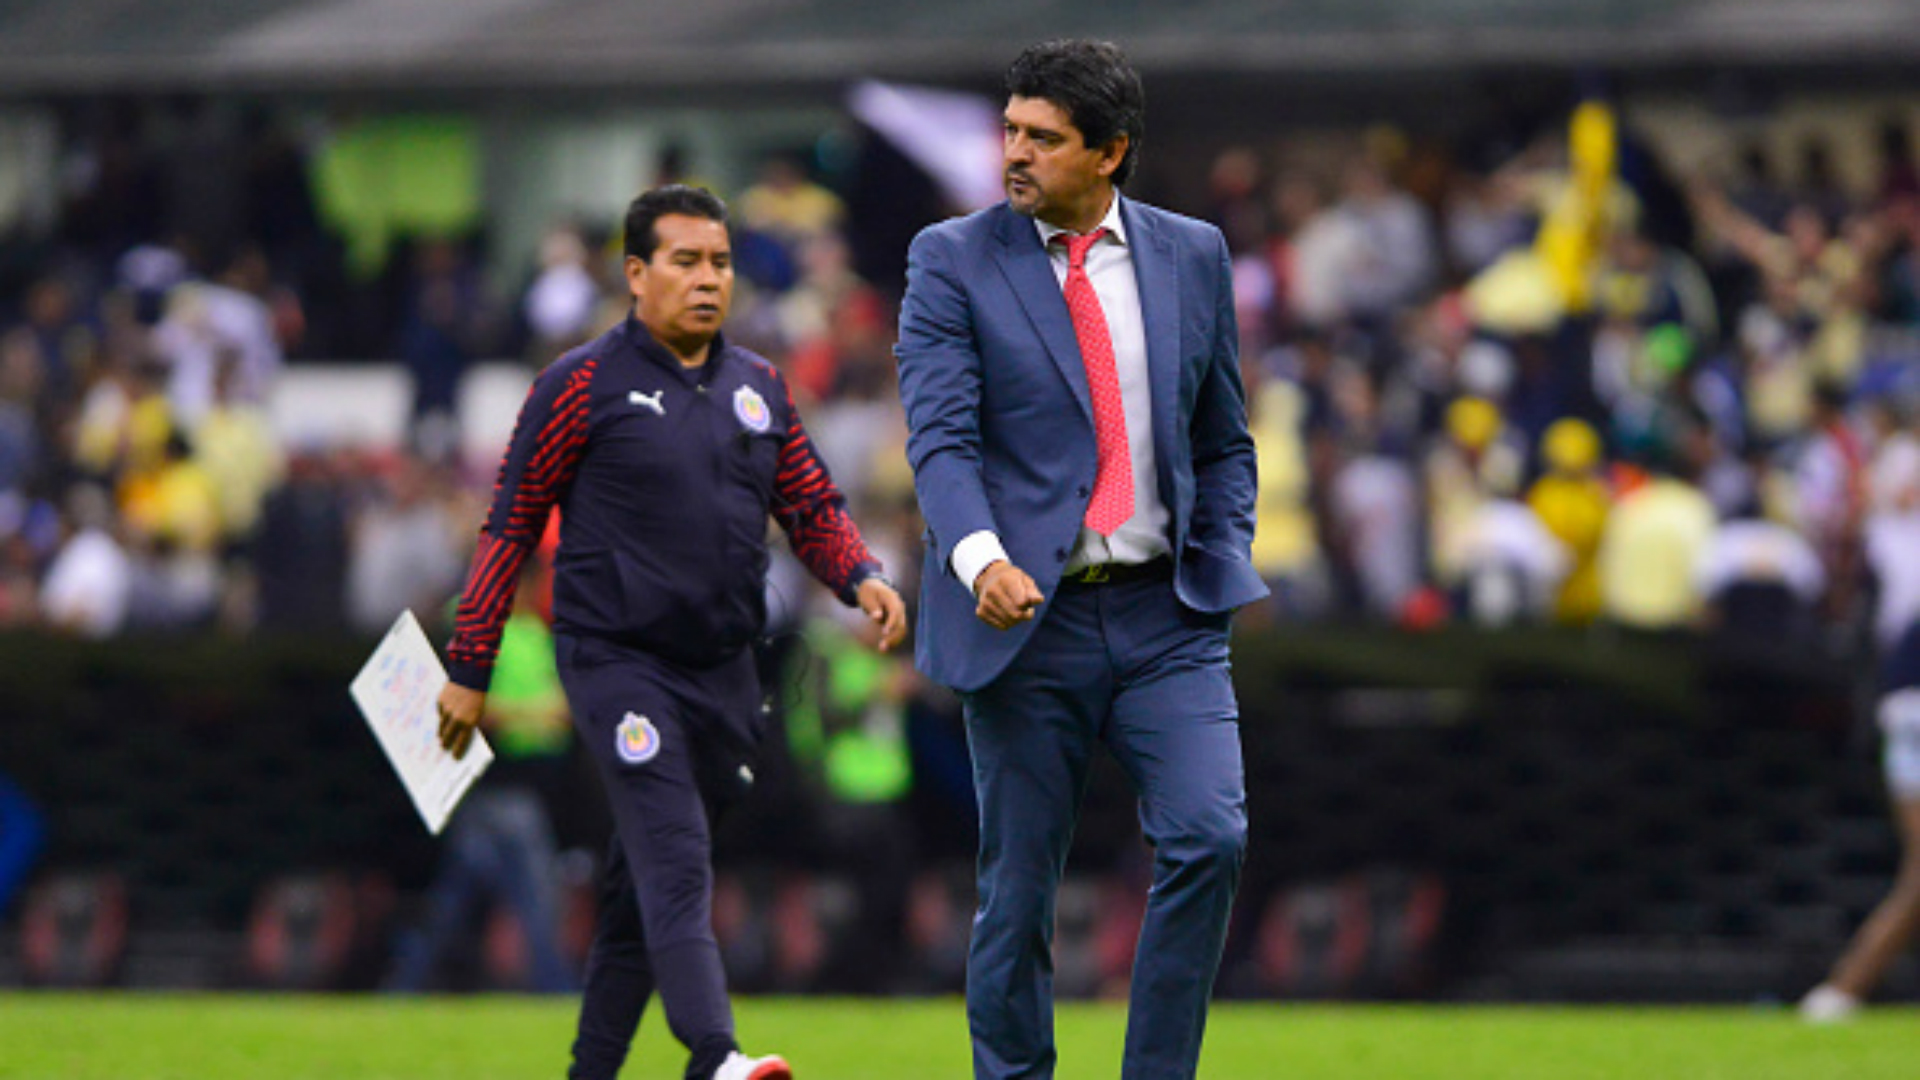 Cardozo Chivas Clausura 2019